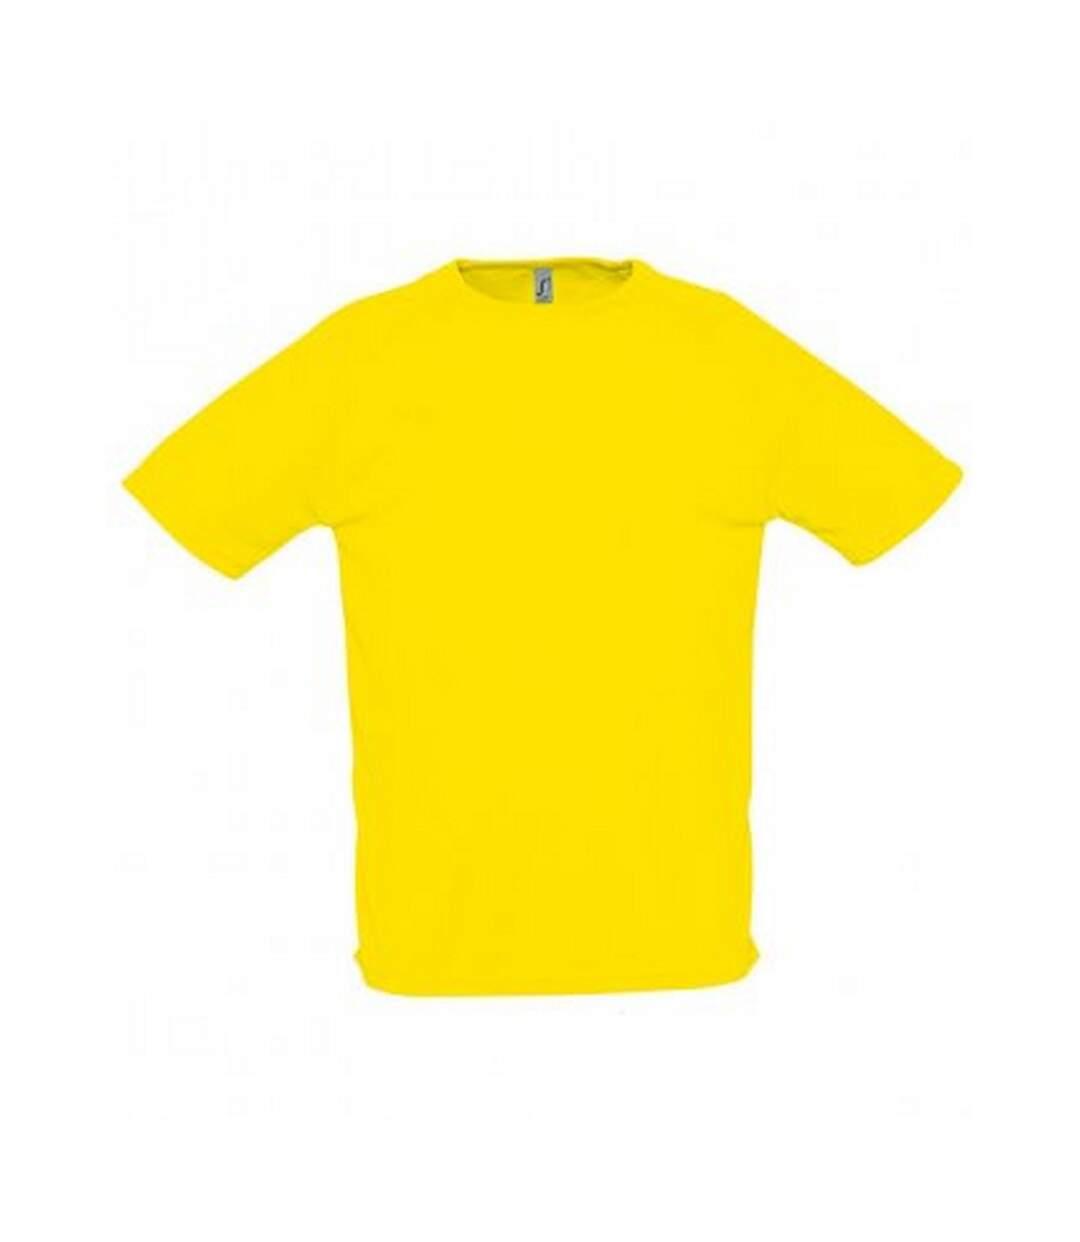 SOLS Mens Sporty Short Sleeve Performance T-Shirt (Lemon) - UTPC303